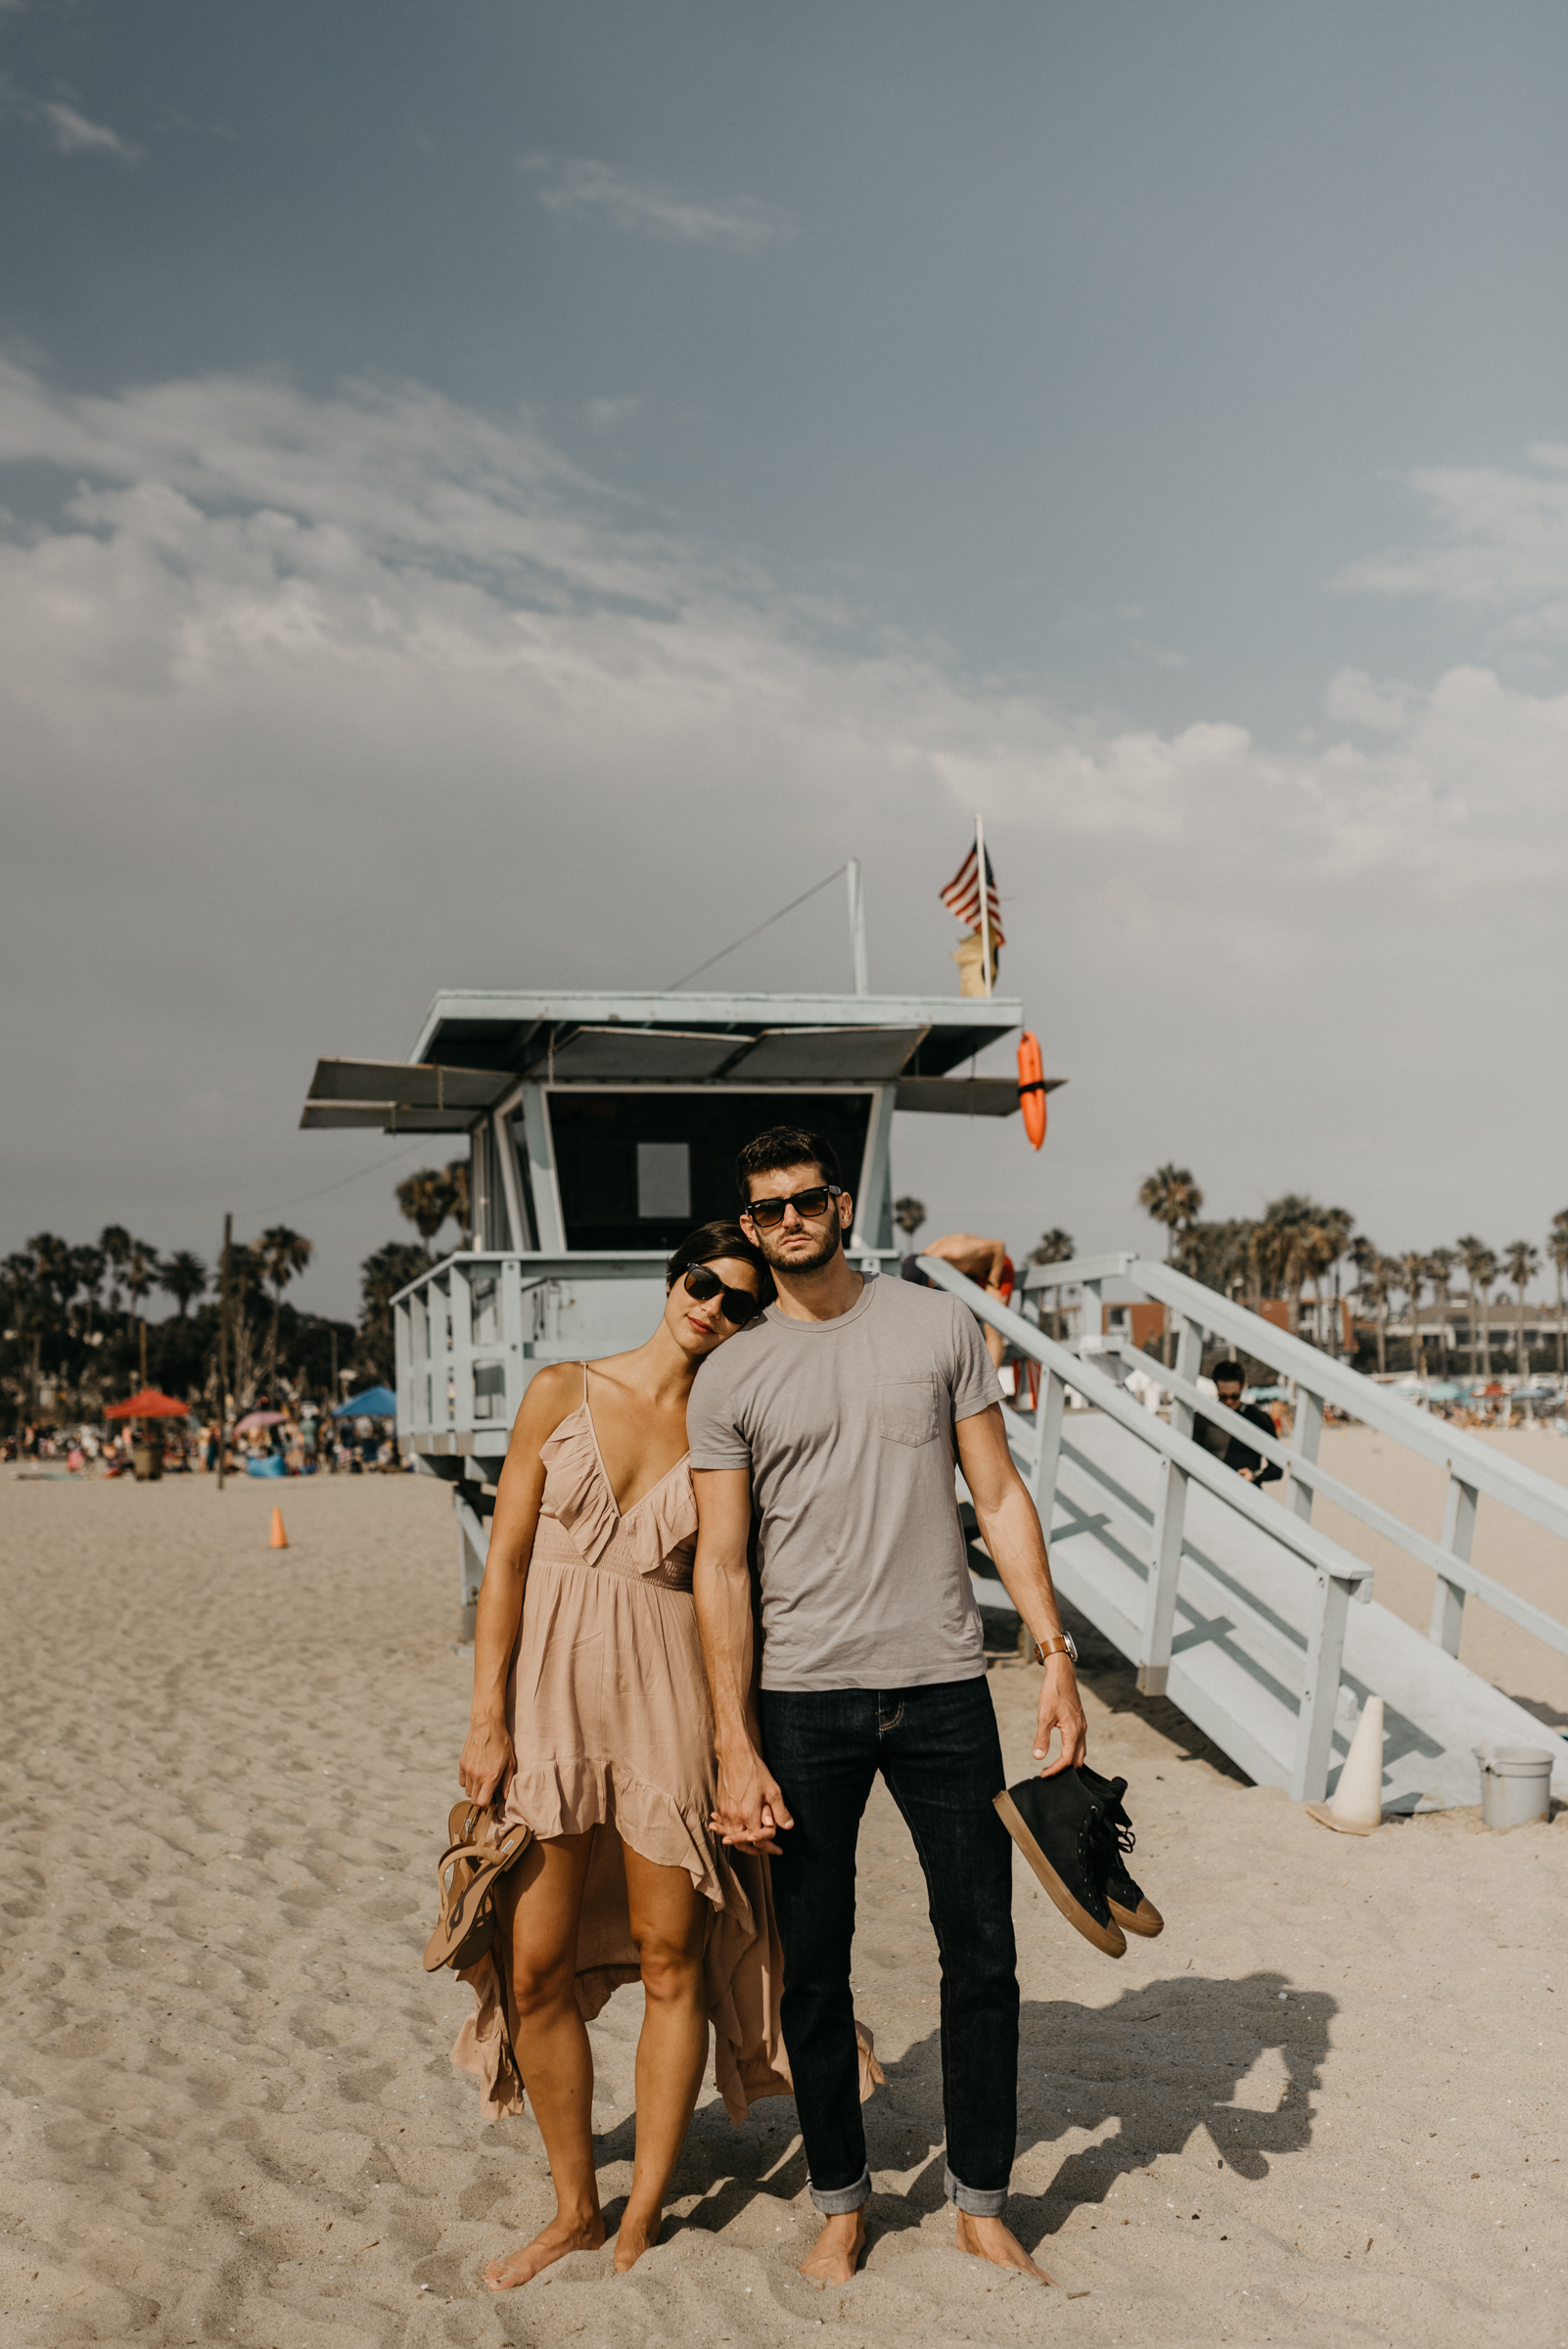 Isaiah + Taylor Photography - Venice Beach & Santa Monica Engagement Session, Los Angeles Wedding Photographer-062.jpg